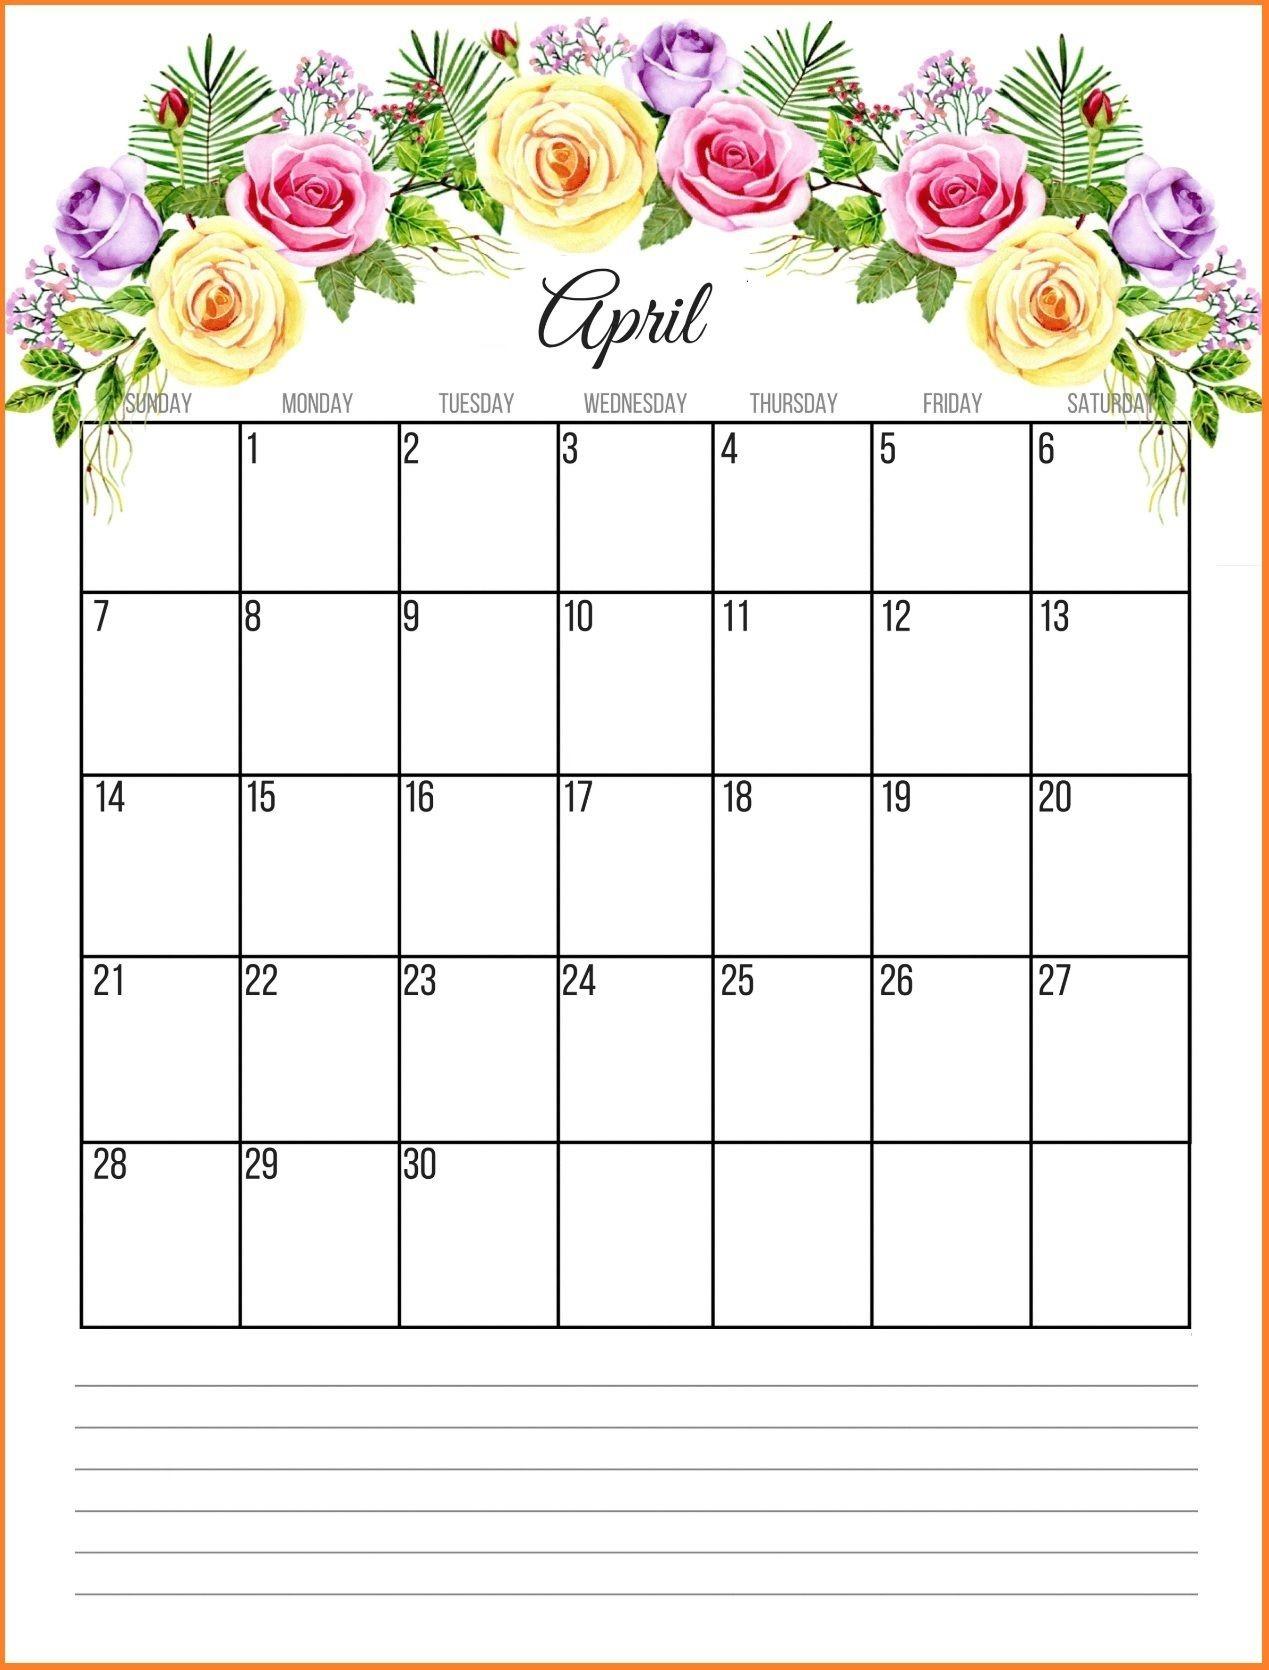 April 2019 Floral Calendar | June 2019 Calendar, Calendar-Template For Calendars With Flowers